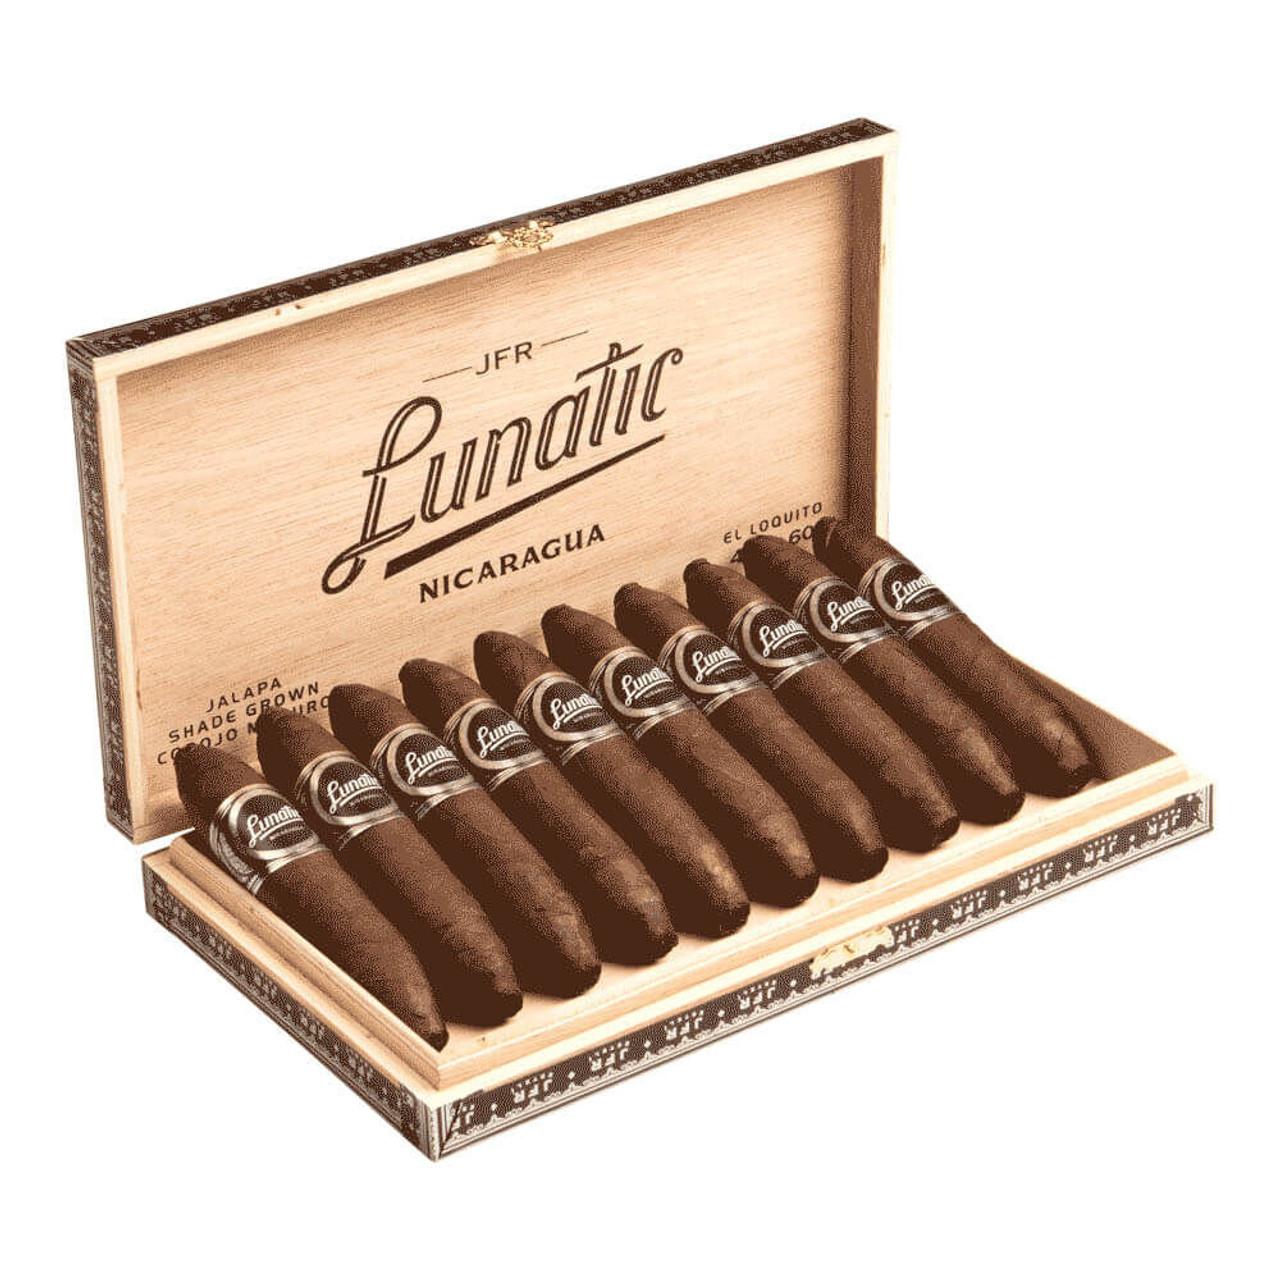 Casa Fernandez JFR Lunatic Loco Maduro El Loquito Cigars - 4.75 x 60 (Box of 10)